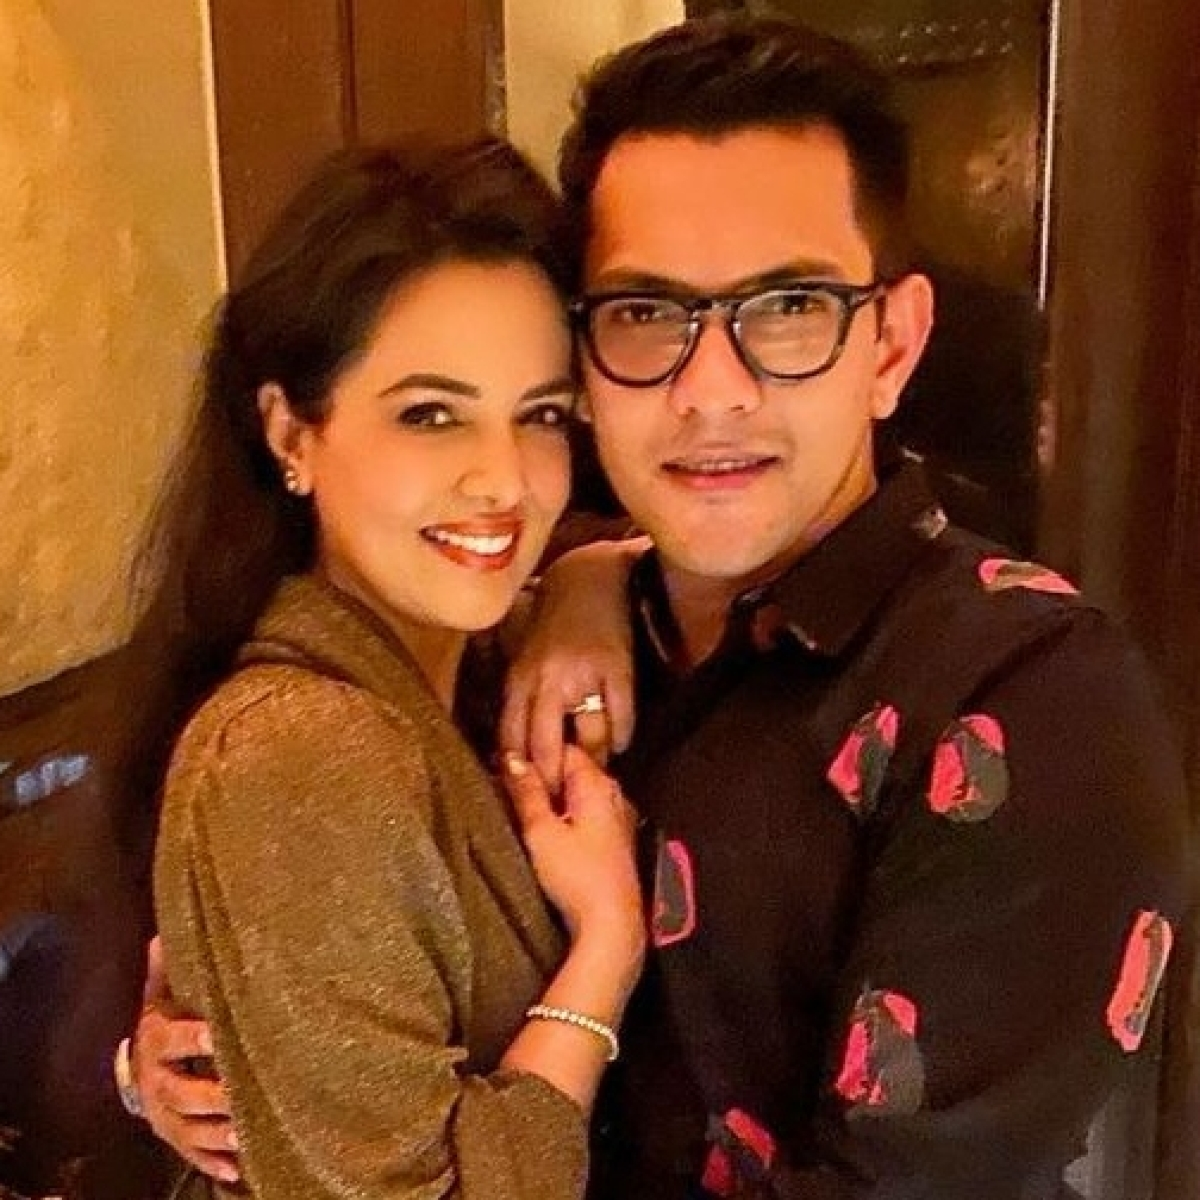 'Barring sleepovers and trips': Aditya Narayan says he's never lived with Shweta Agarwal before marriage